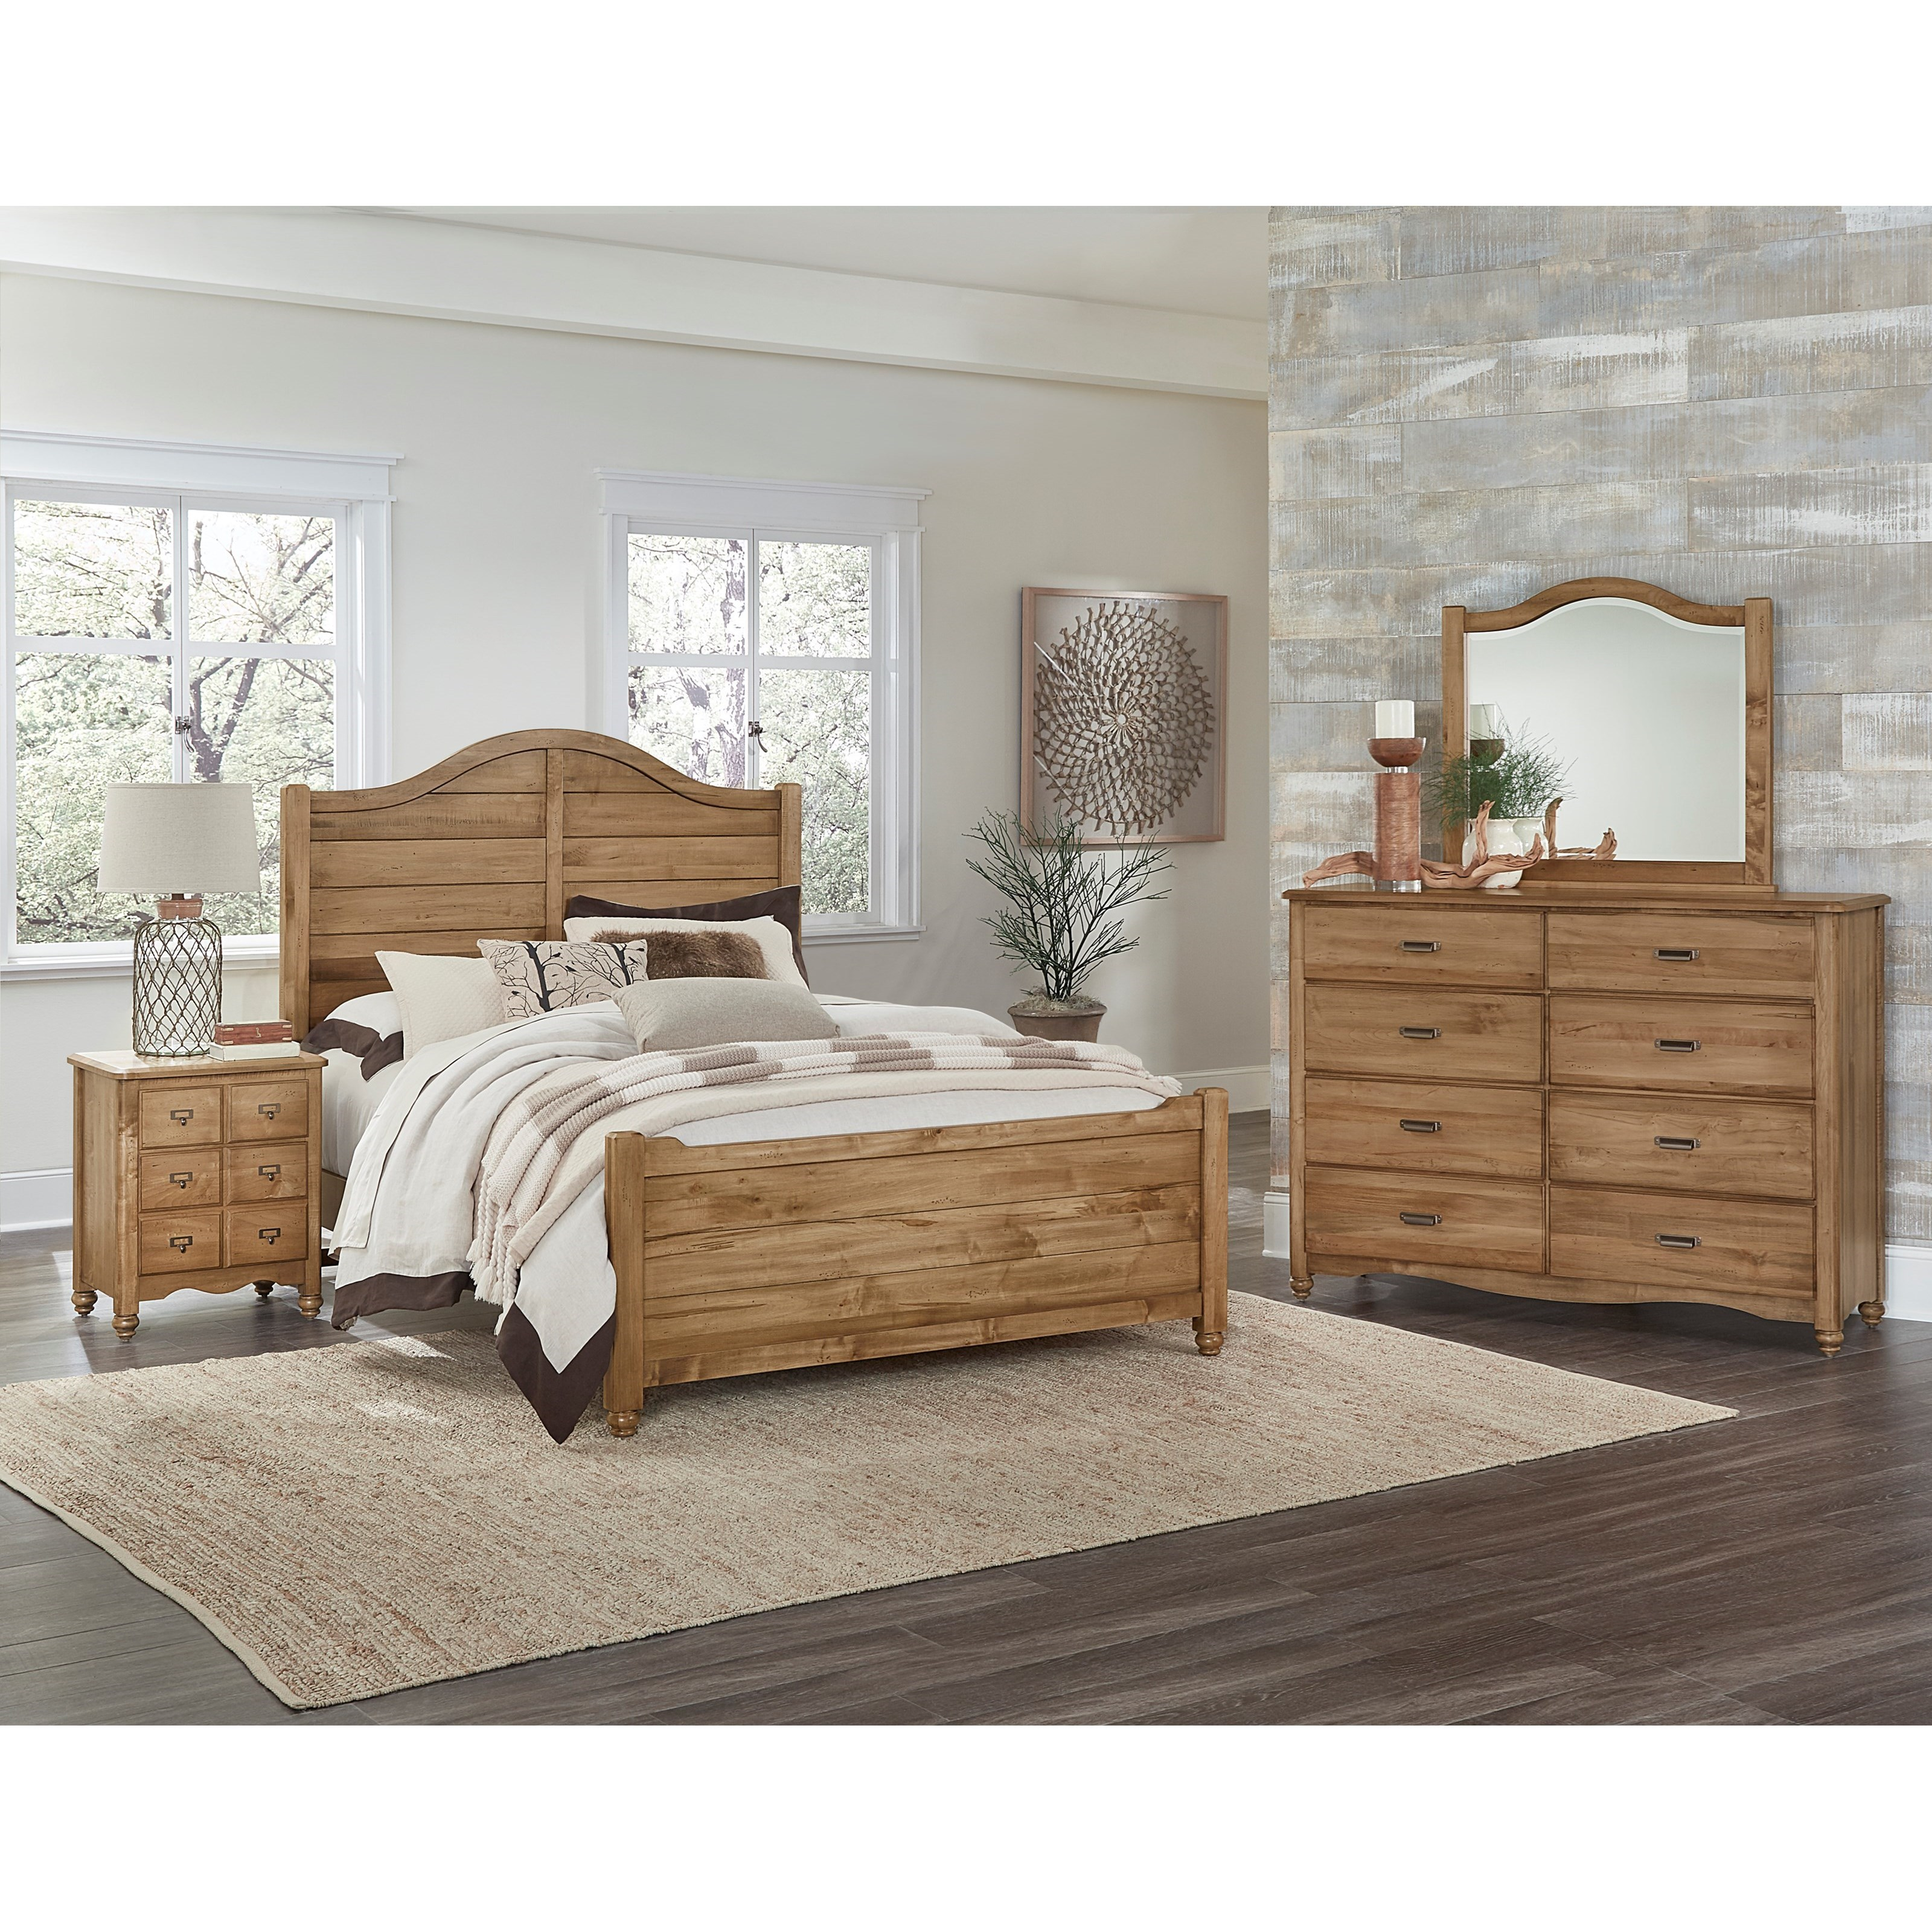 Vaughan Bassett American Maple Twin Bedroom Group - Item Number: 402 T Bedroom Group 2